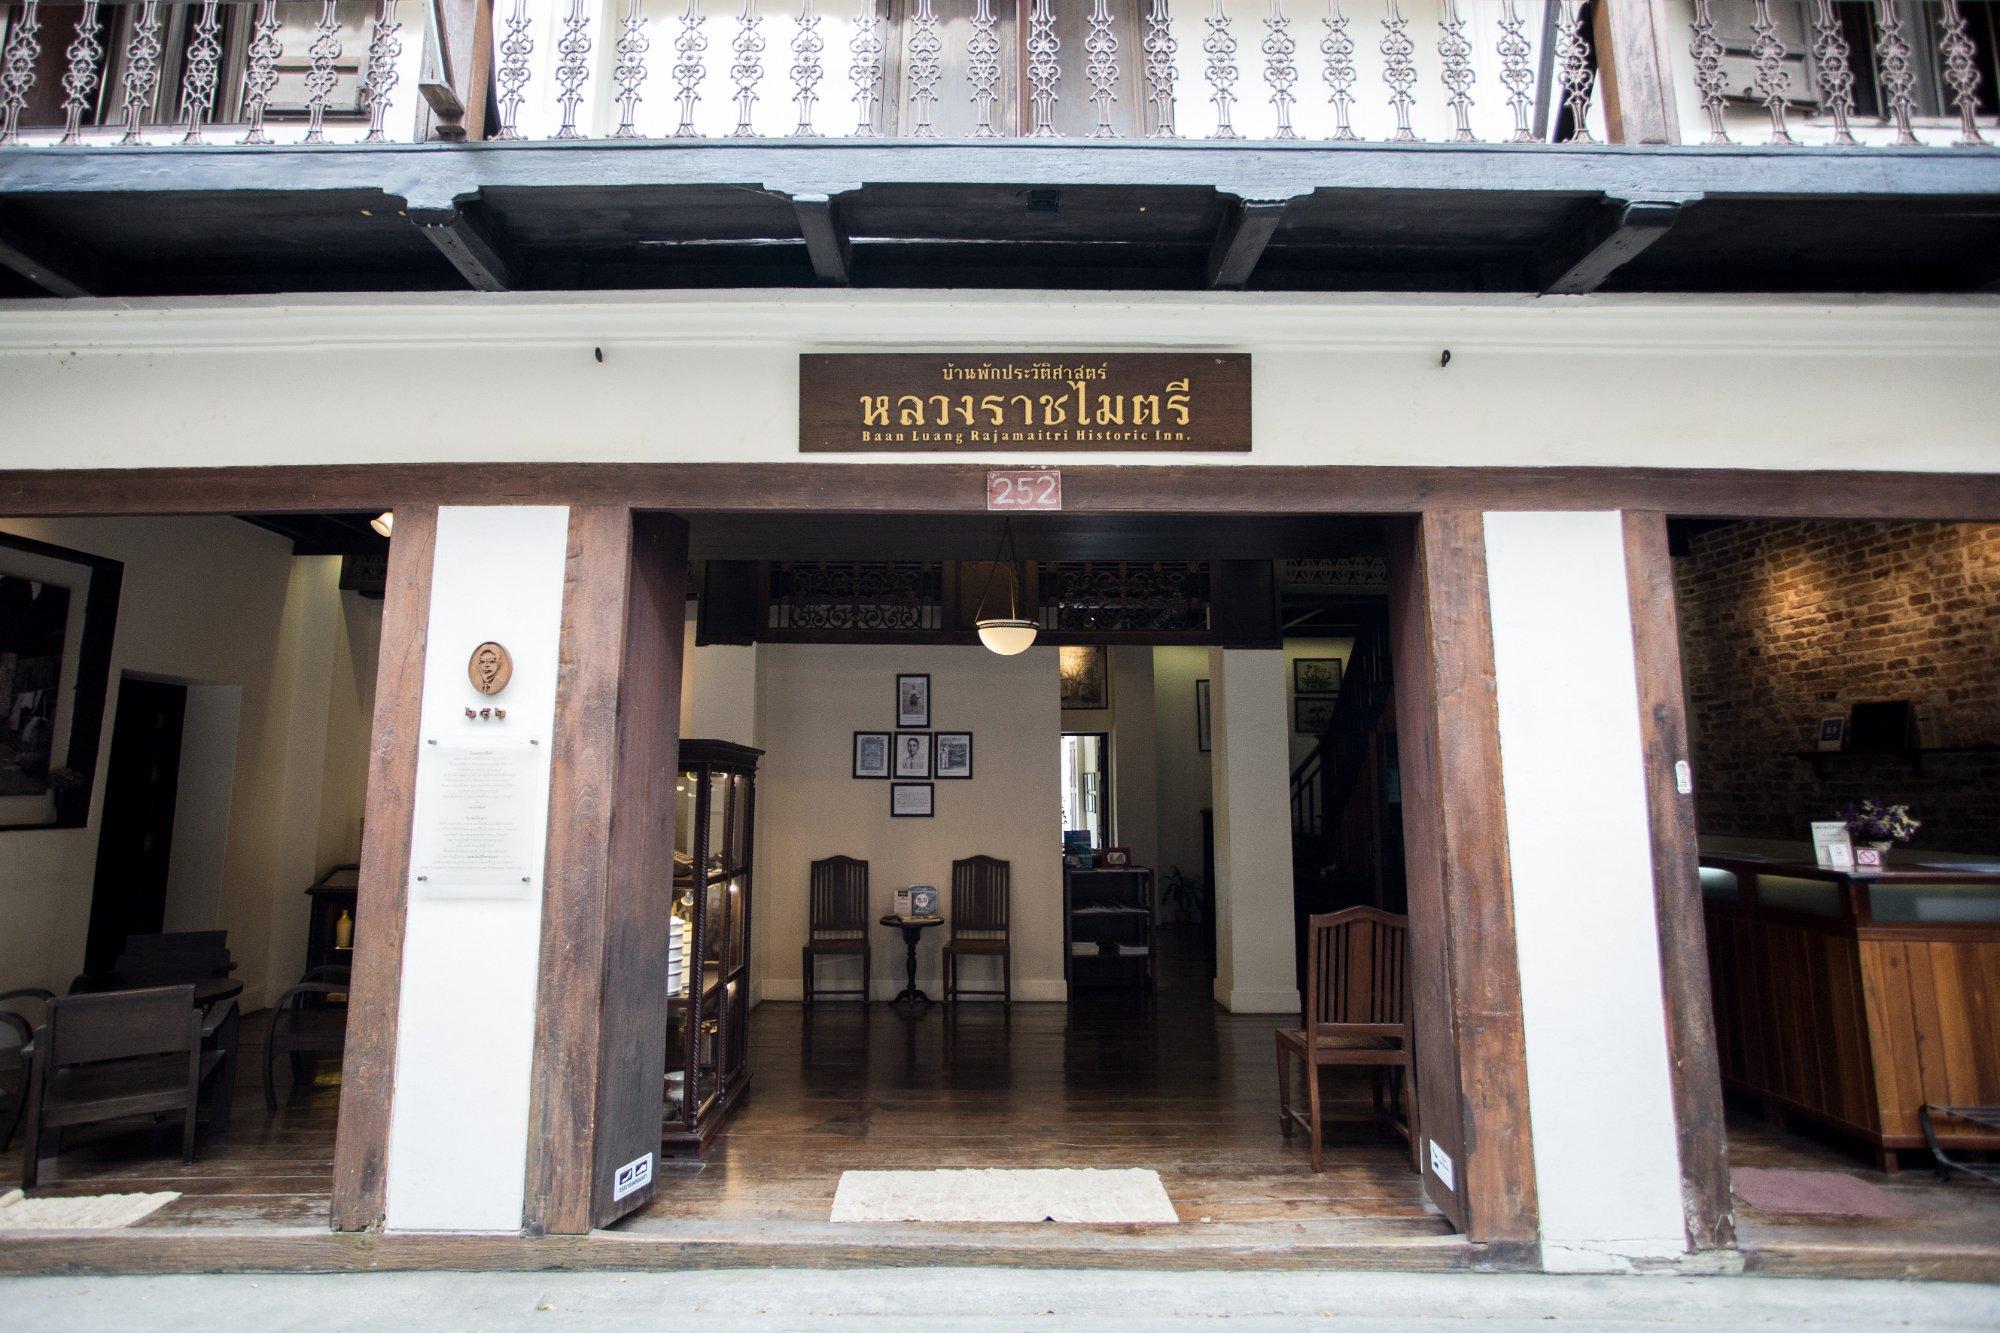 Maneechan Resort & Hotel